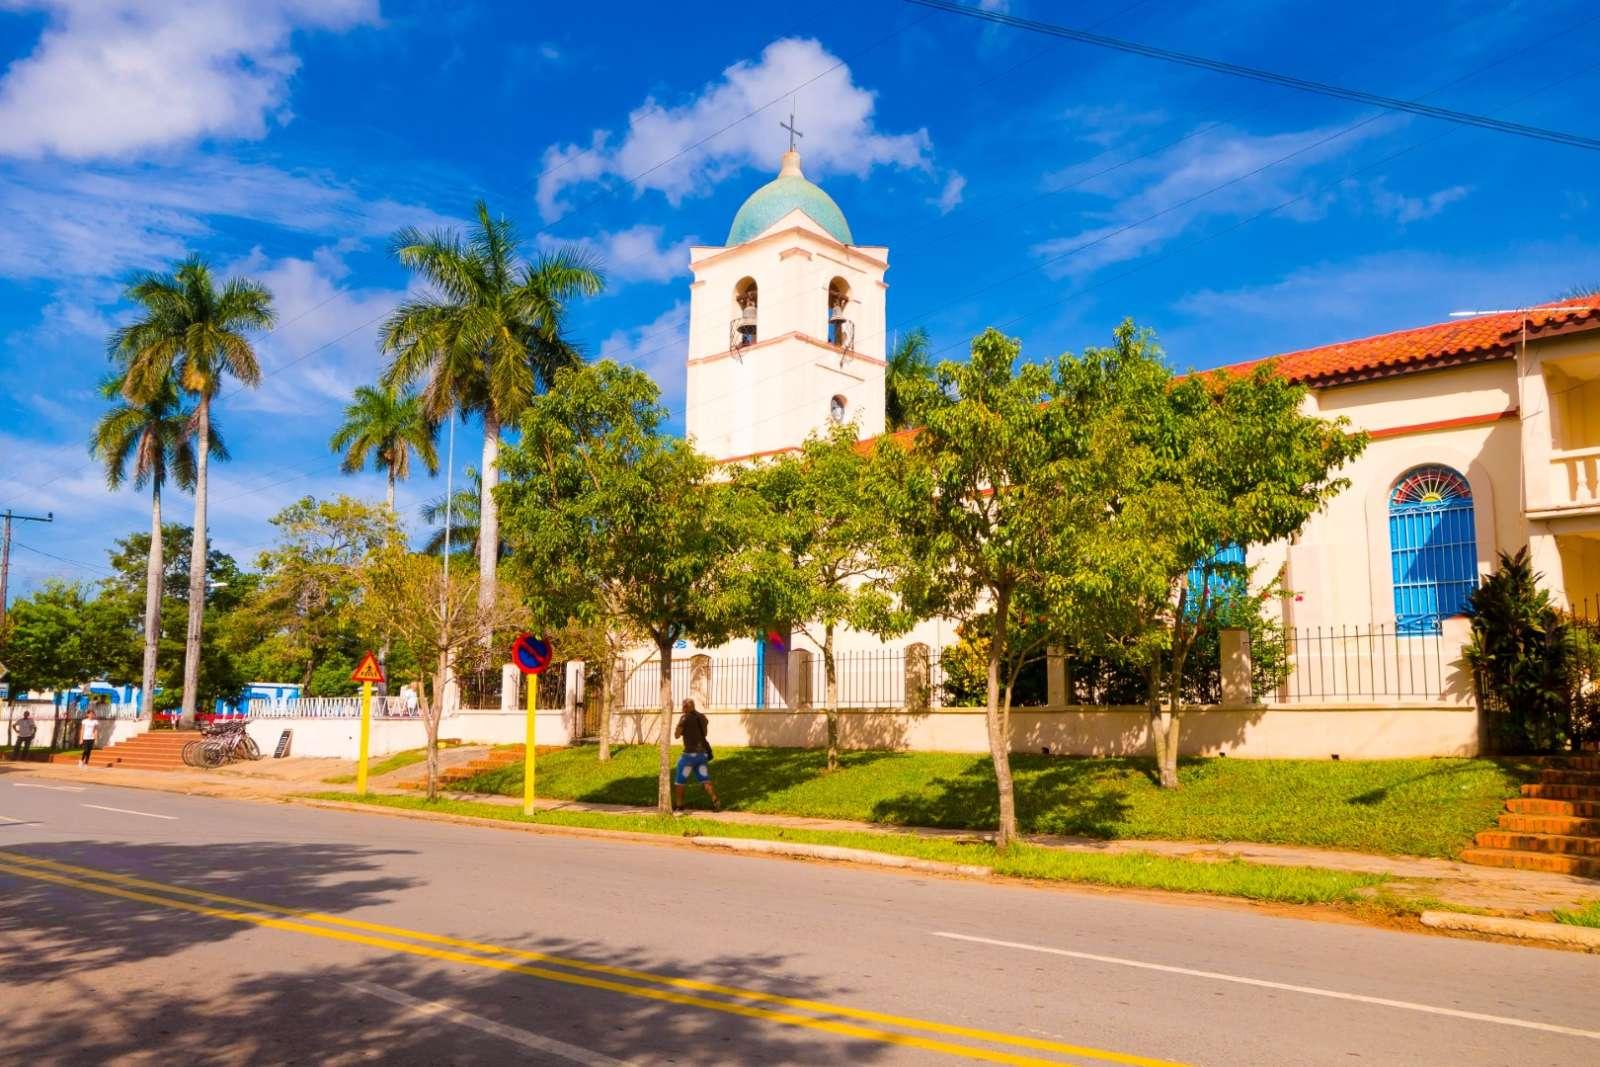 The main street running through Vinales town